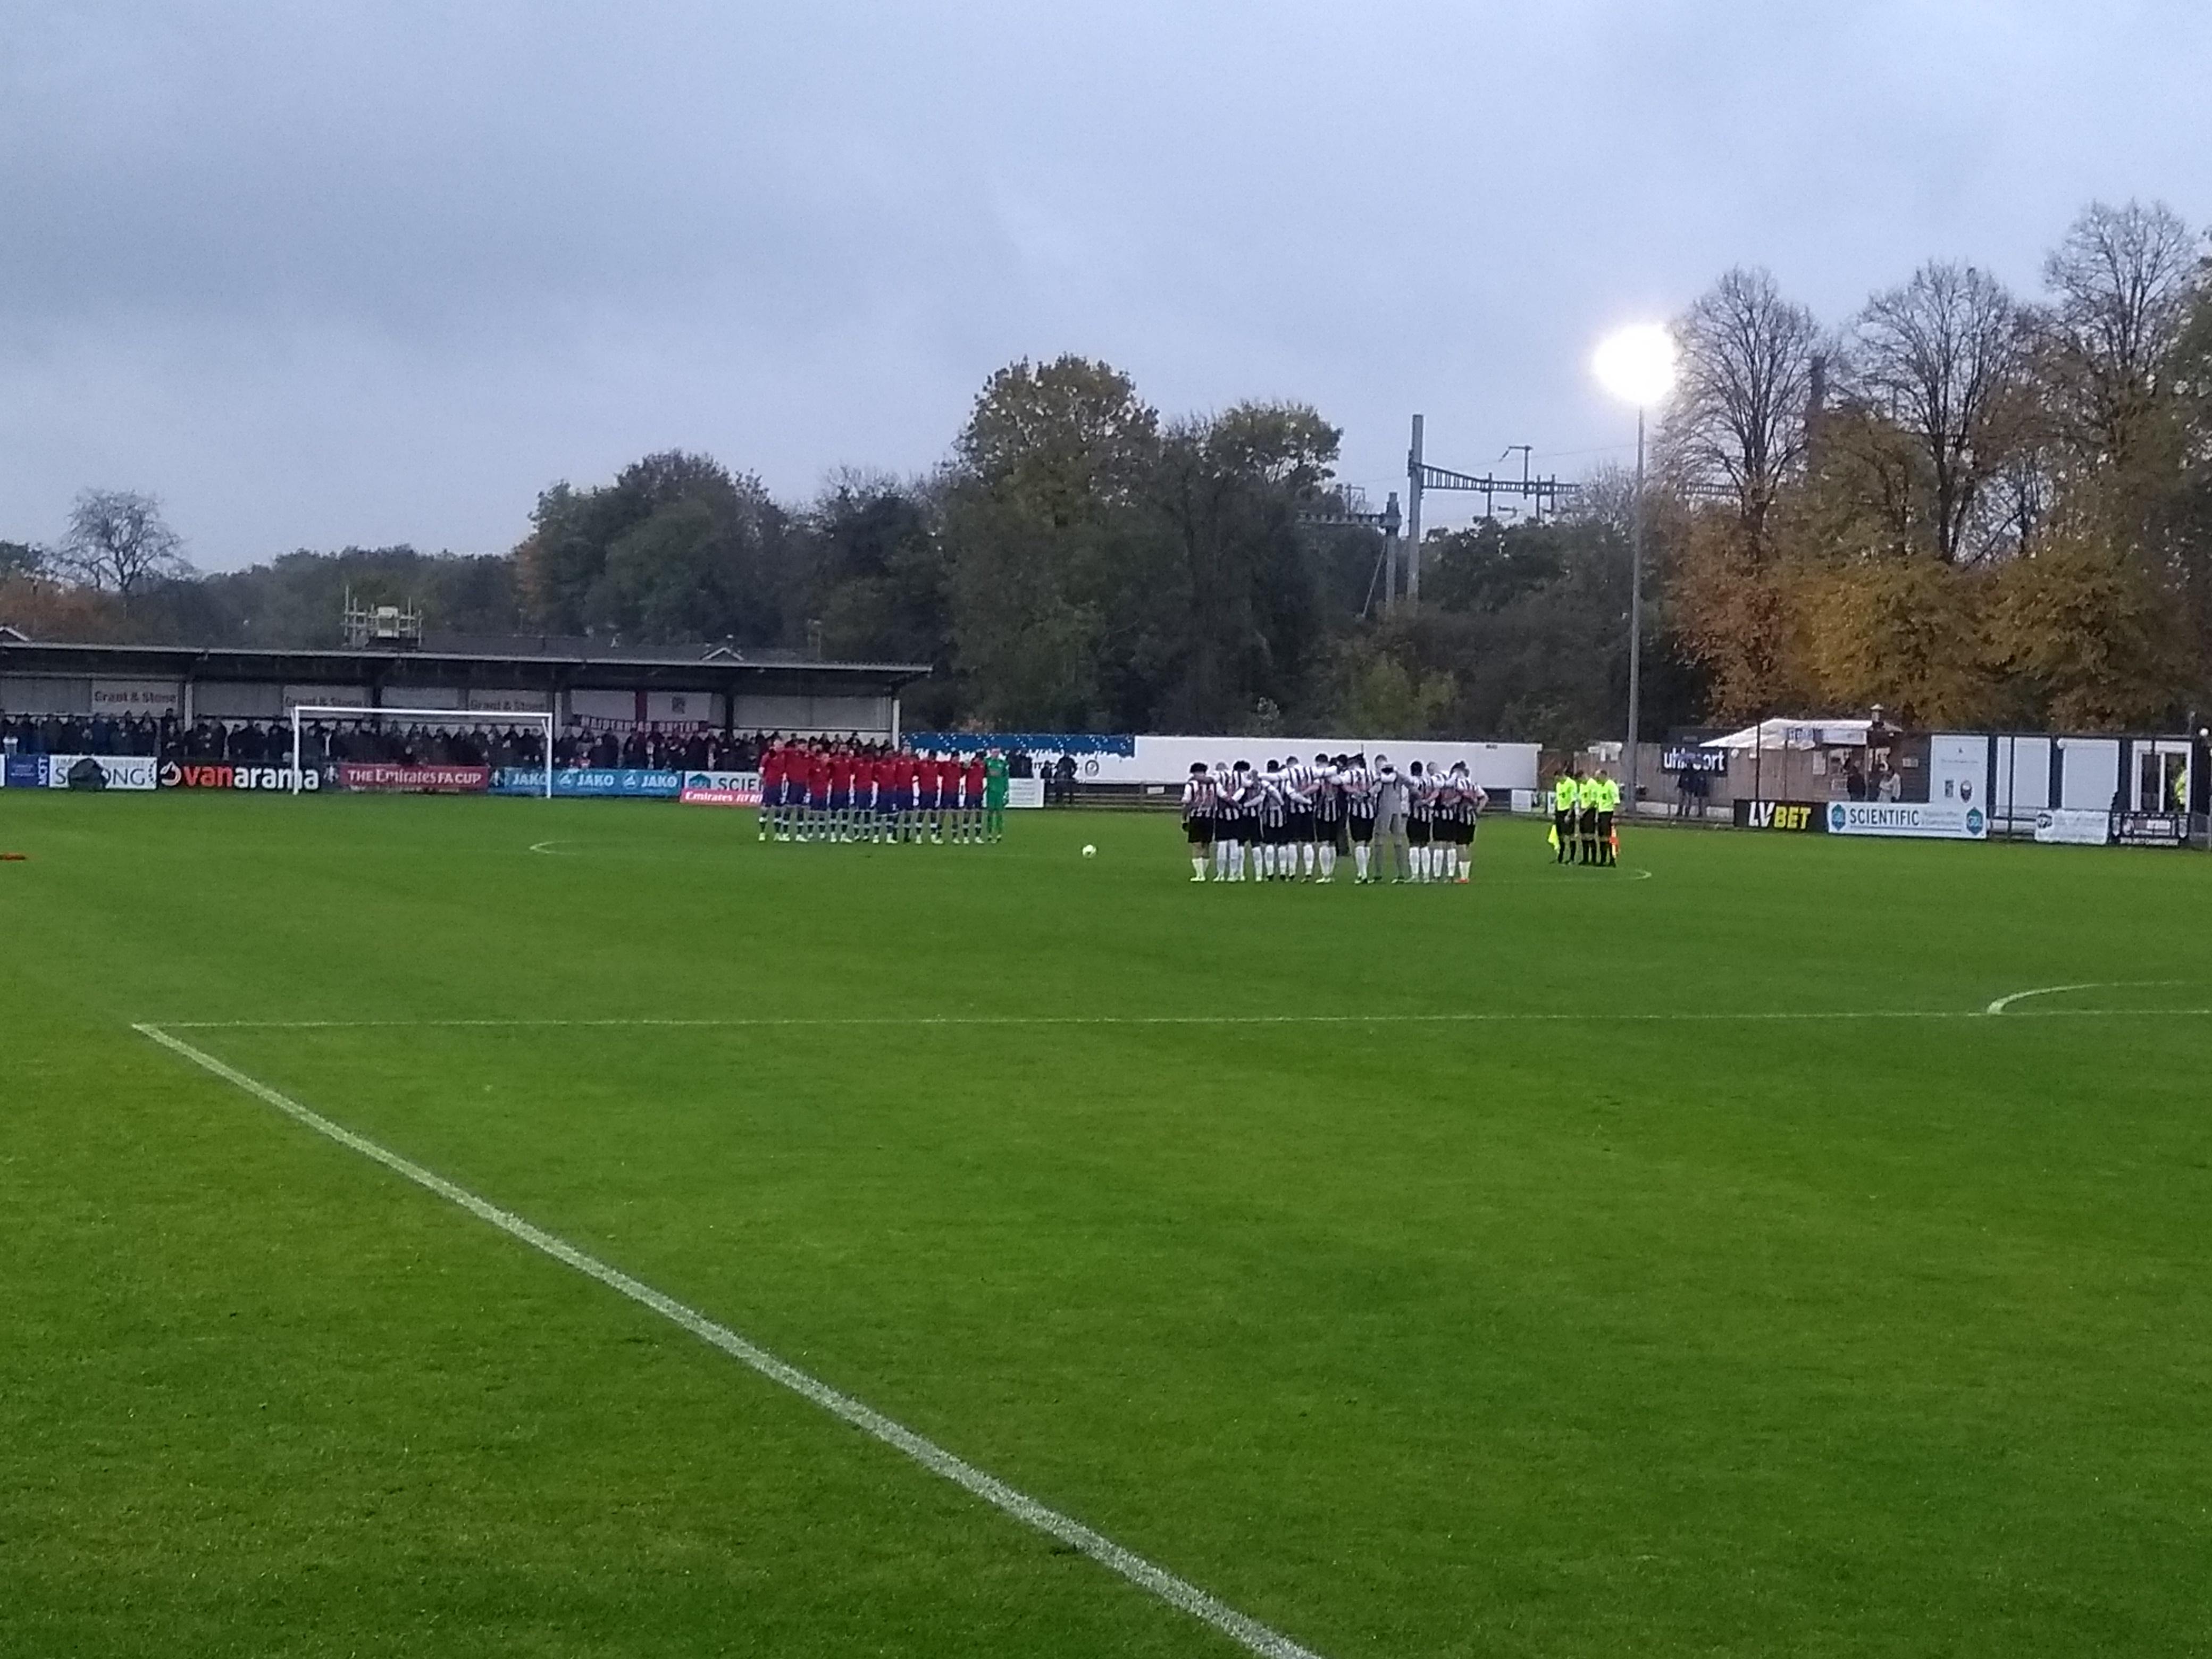 Maidenhead United FC ground